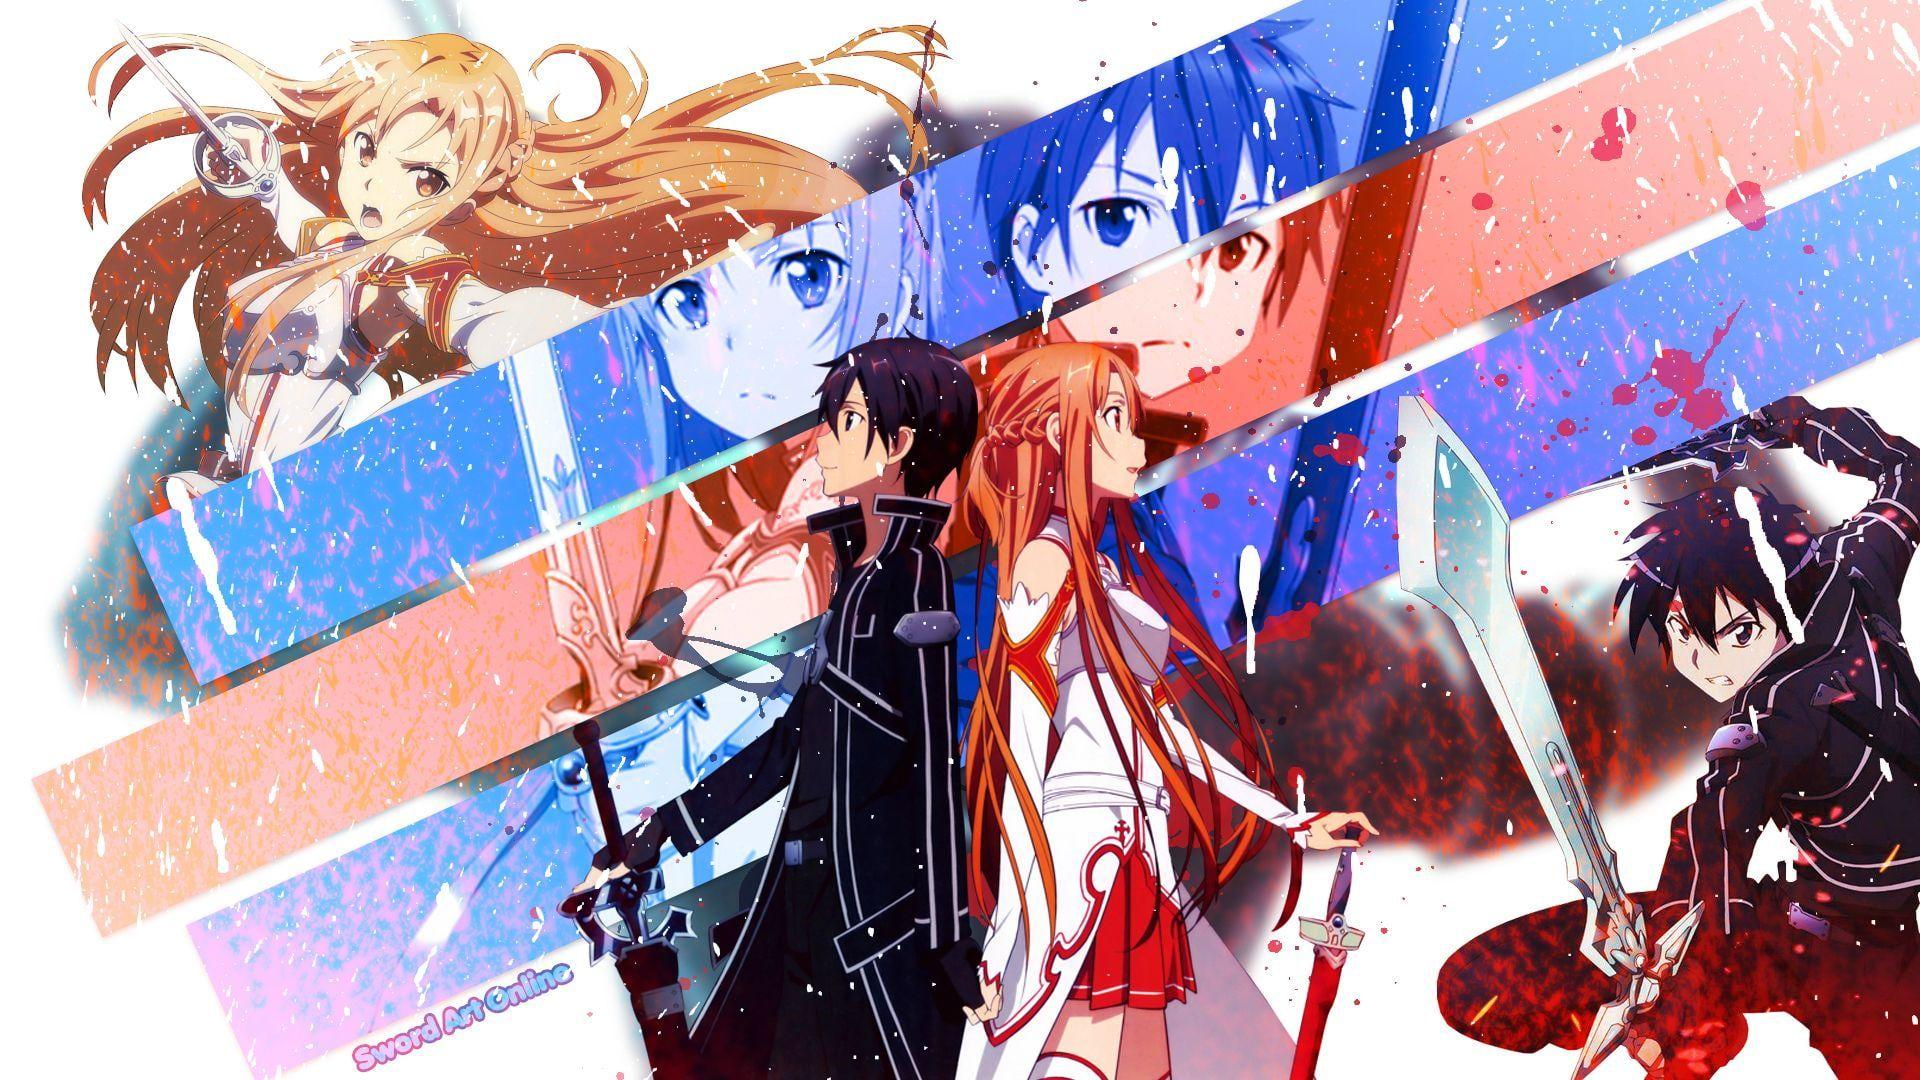 Yuuki Asuna Anime Girls Kirigaya Kazuto Sword Art Online 1080p Wallpaper Hdwallpaper Desktop In 2020 Sword Art Online Wallpaper Sword Art Online Kirito Sword Art